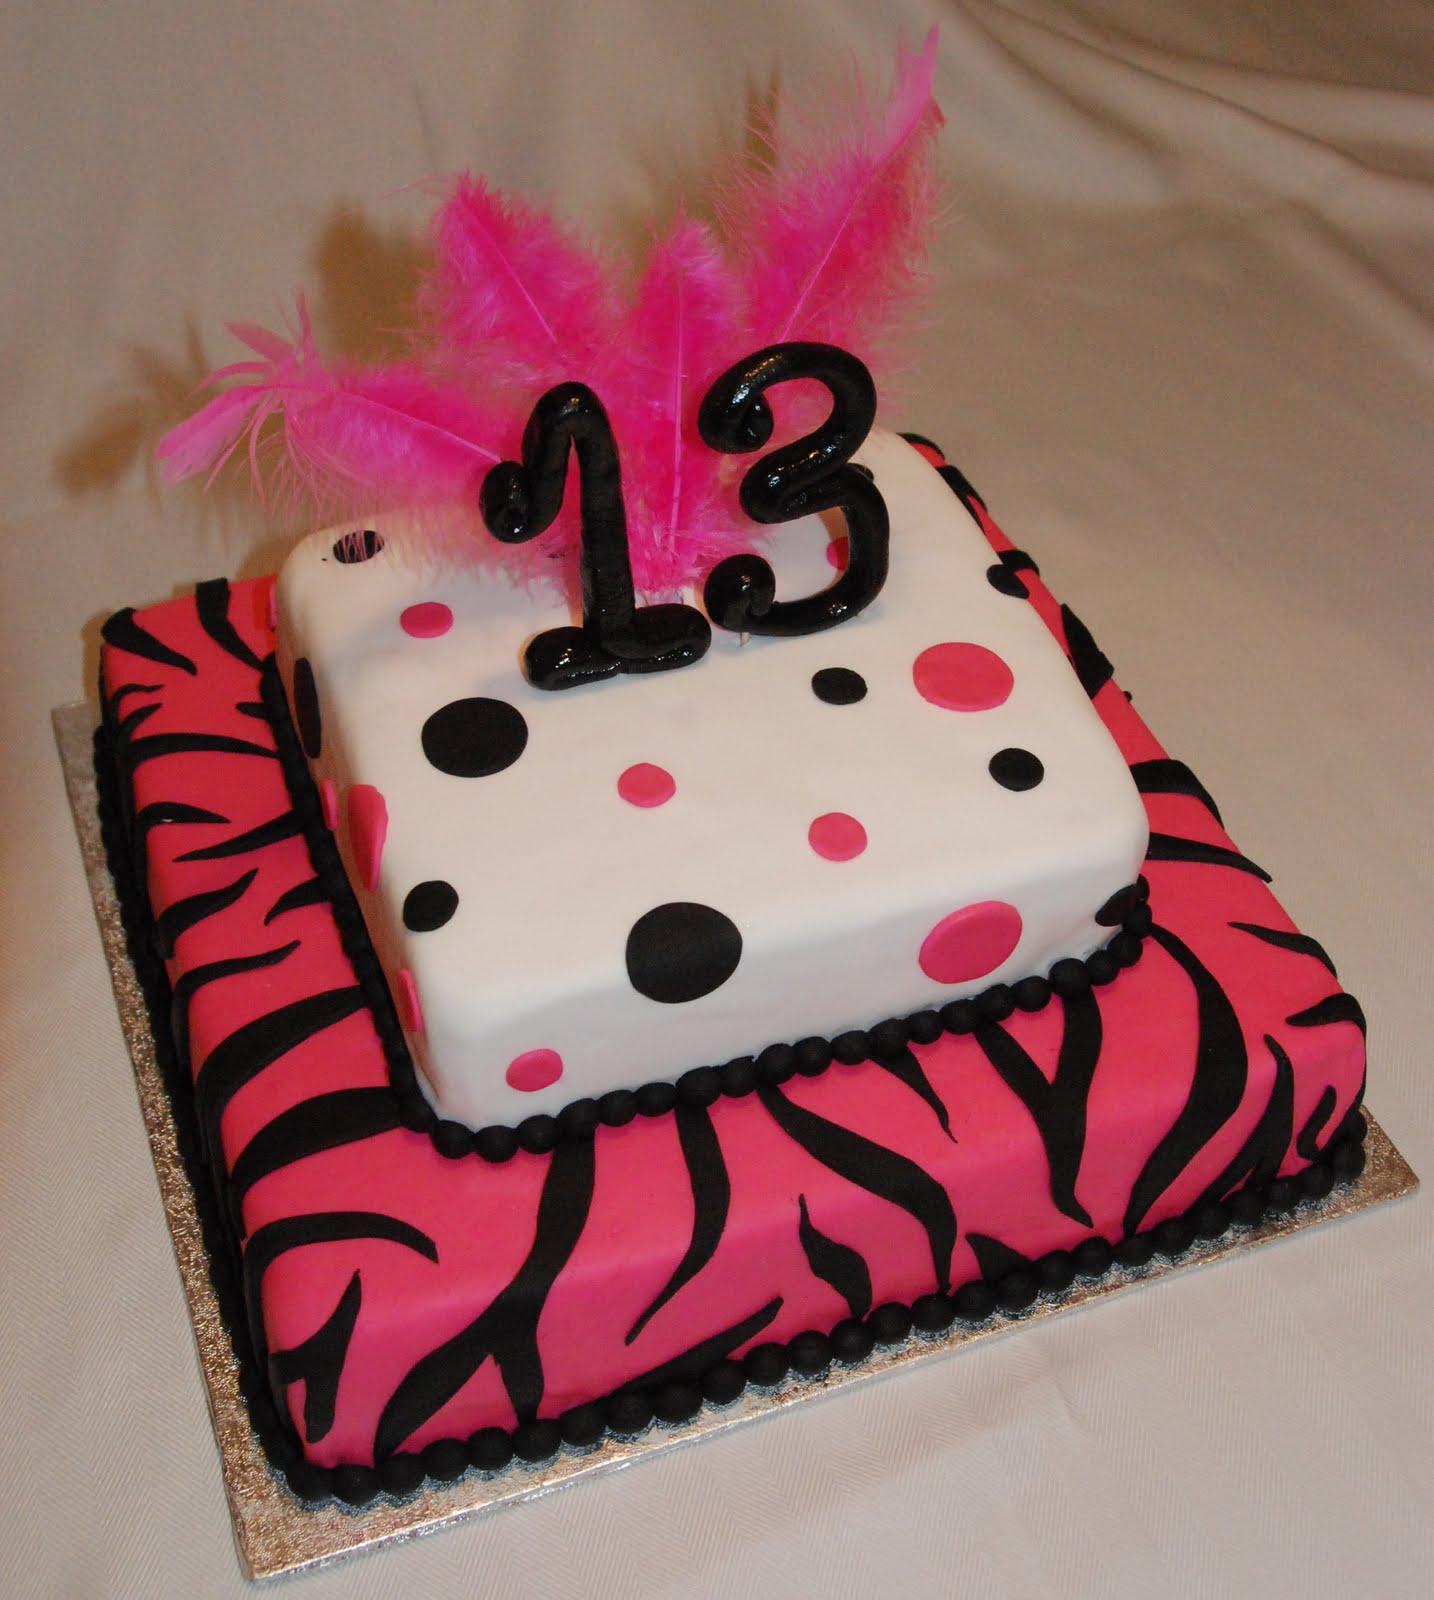 Cake Creations By Trish 13th Birthday Cake